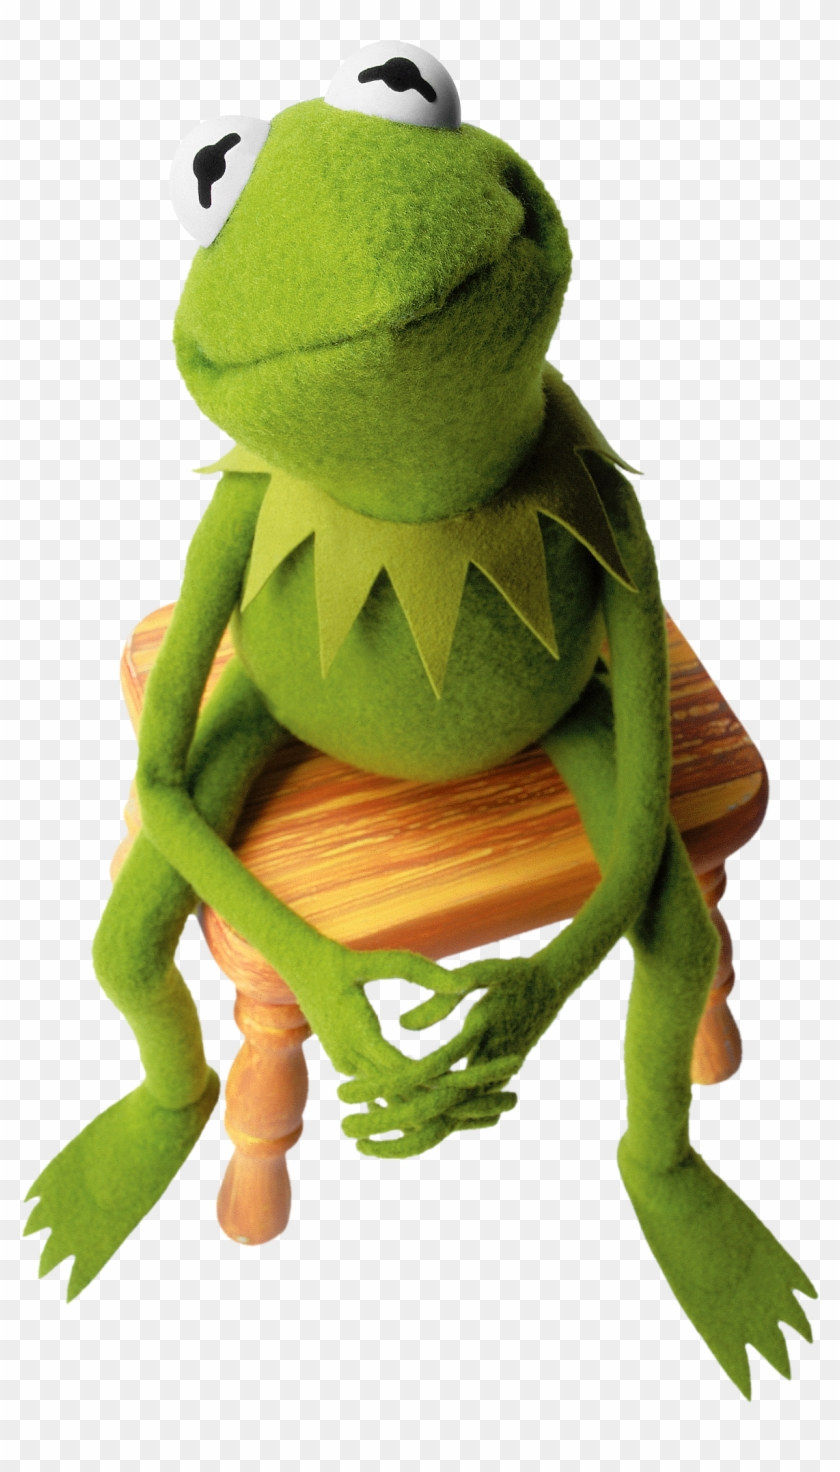 Kermit Png Pluspng.